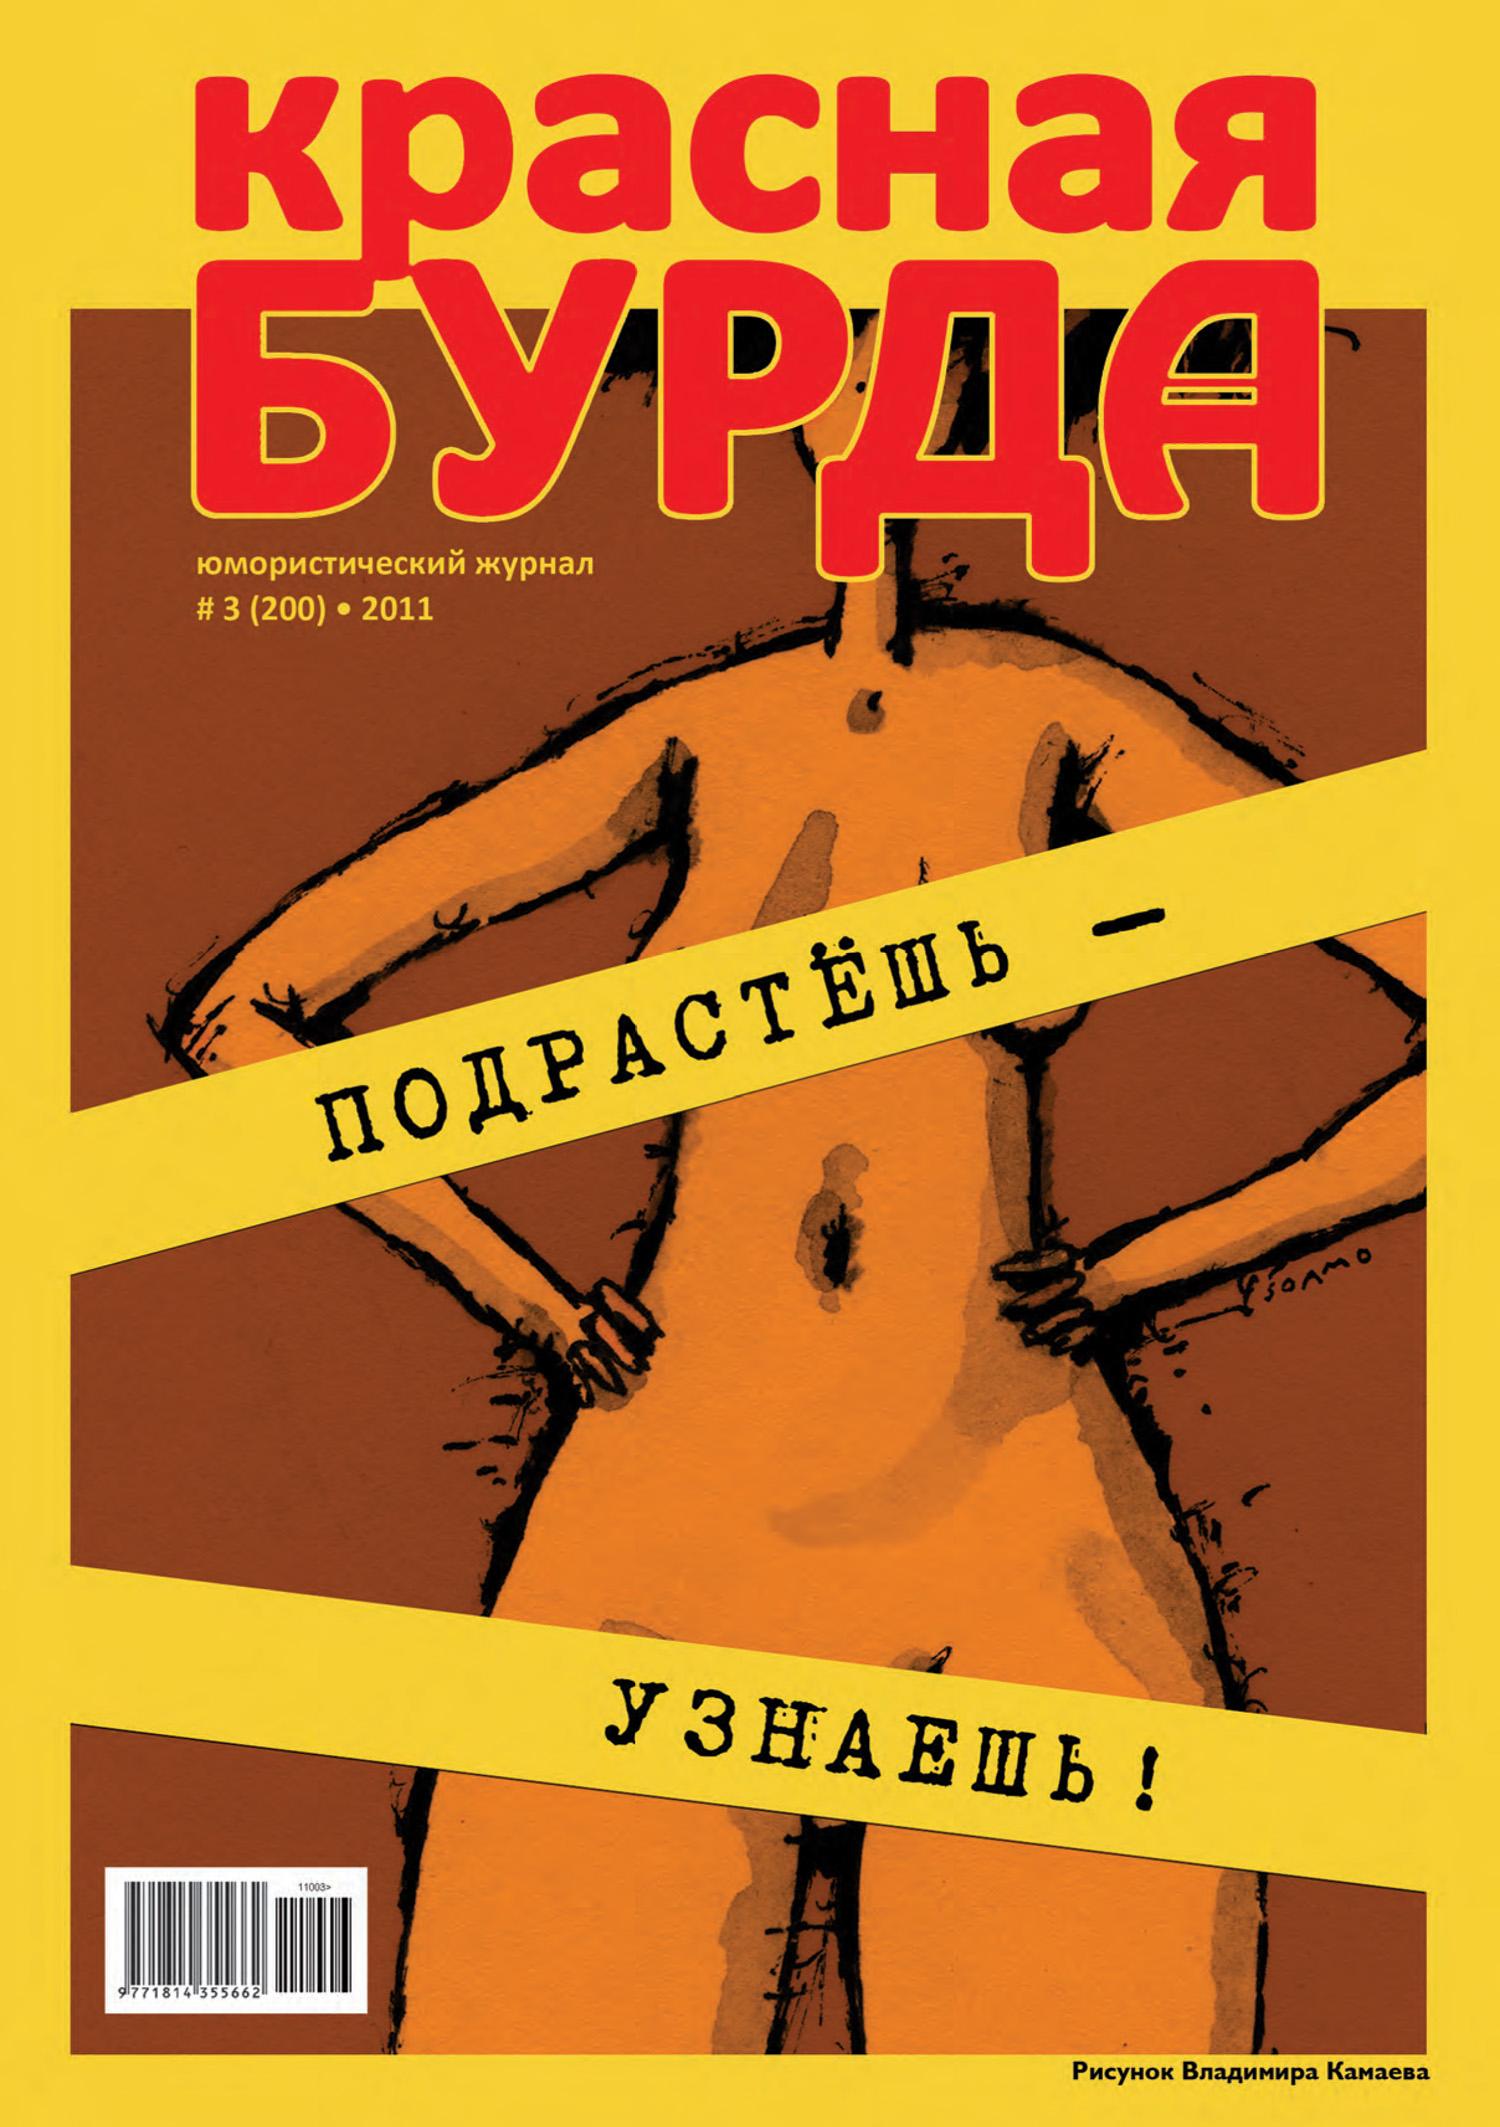 Красная бурда. Юмористический журнал №3 (200) 2011